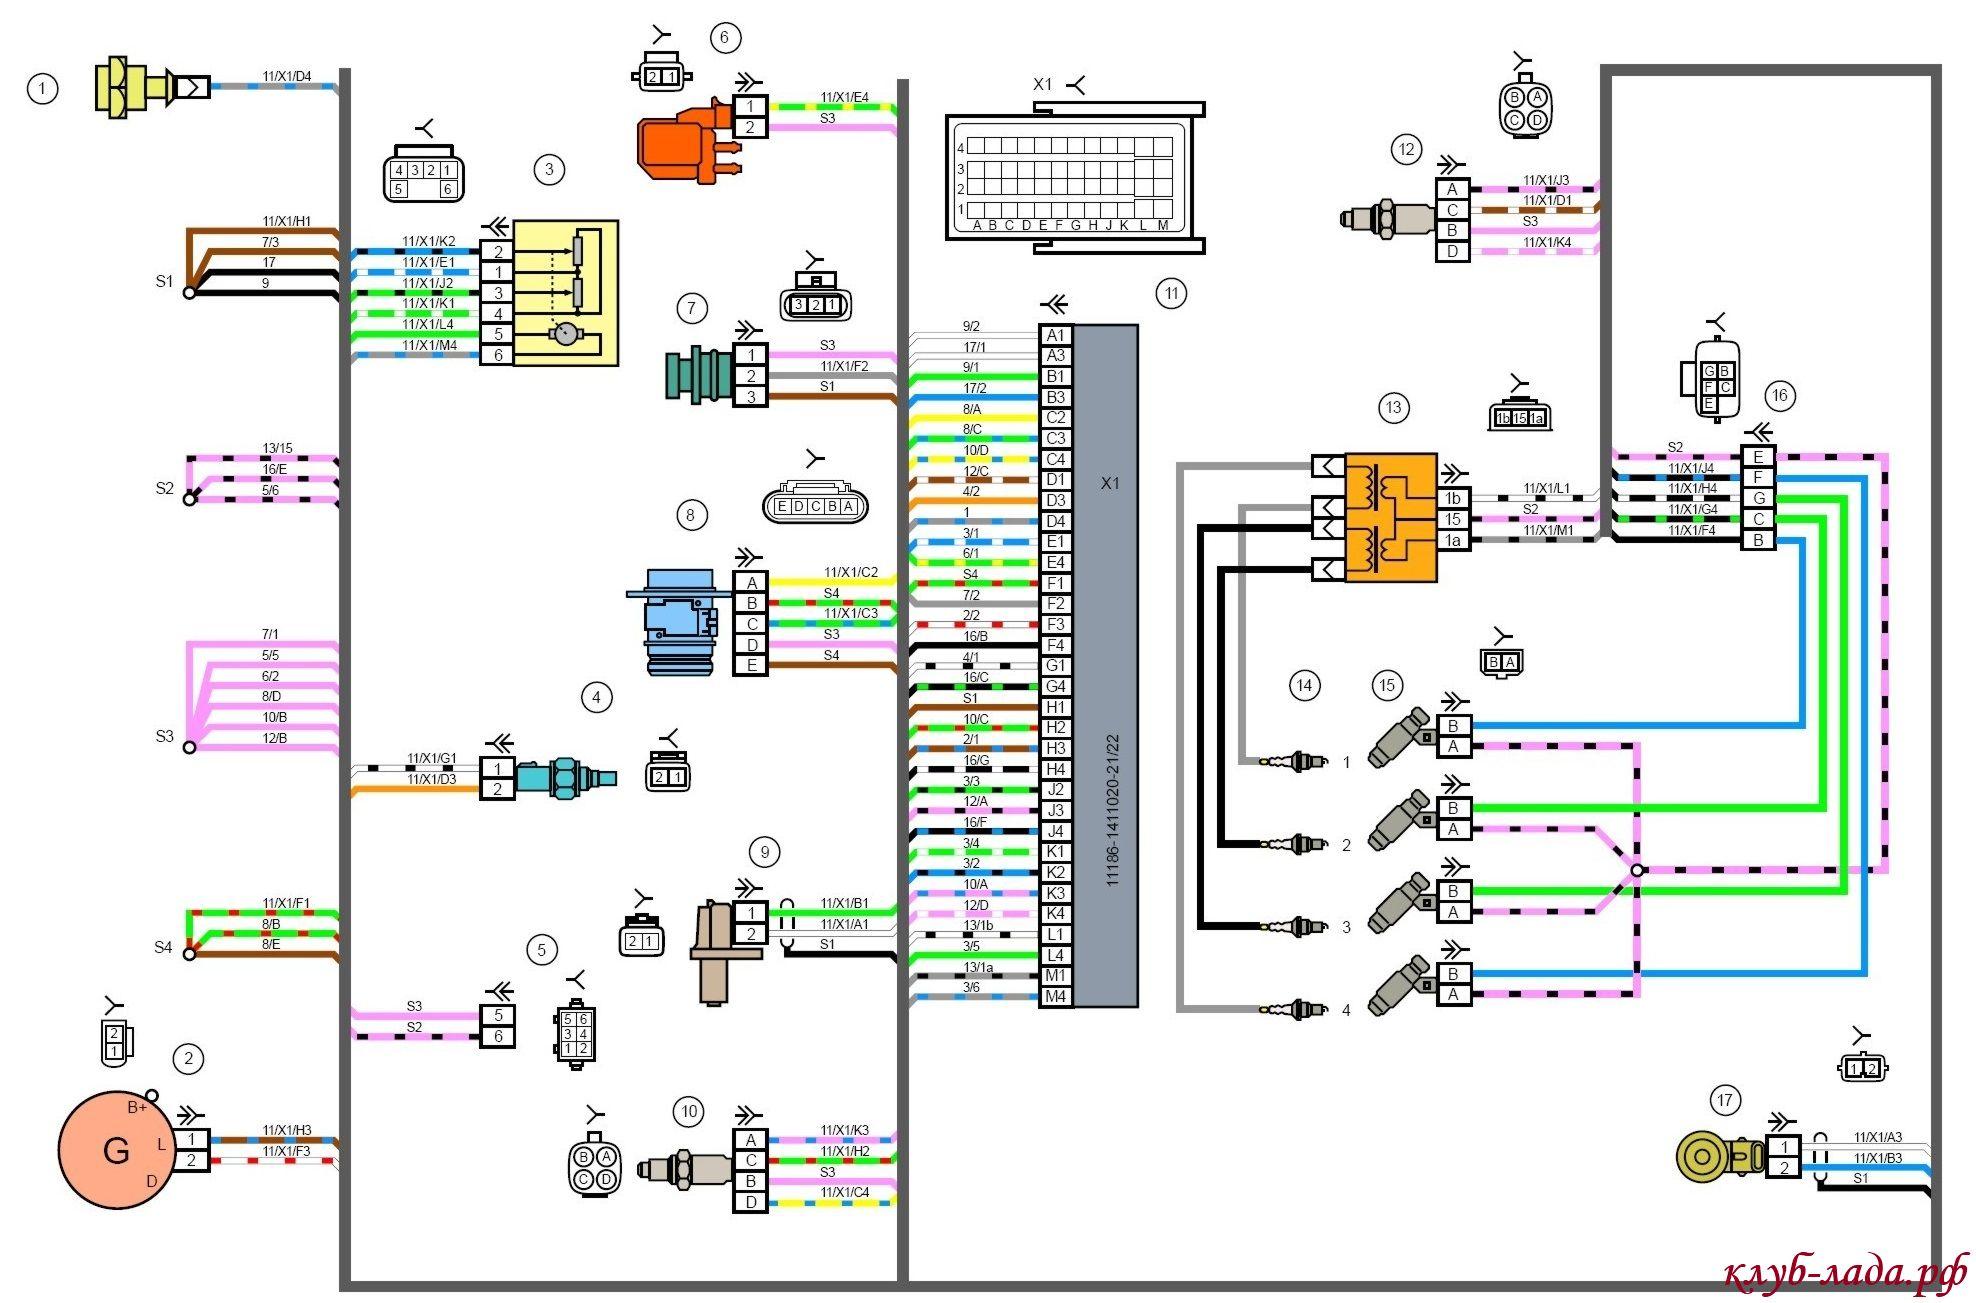 Общая схема электрооборудования ваз 2190 лада гранта.